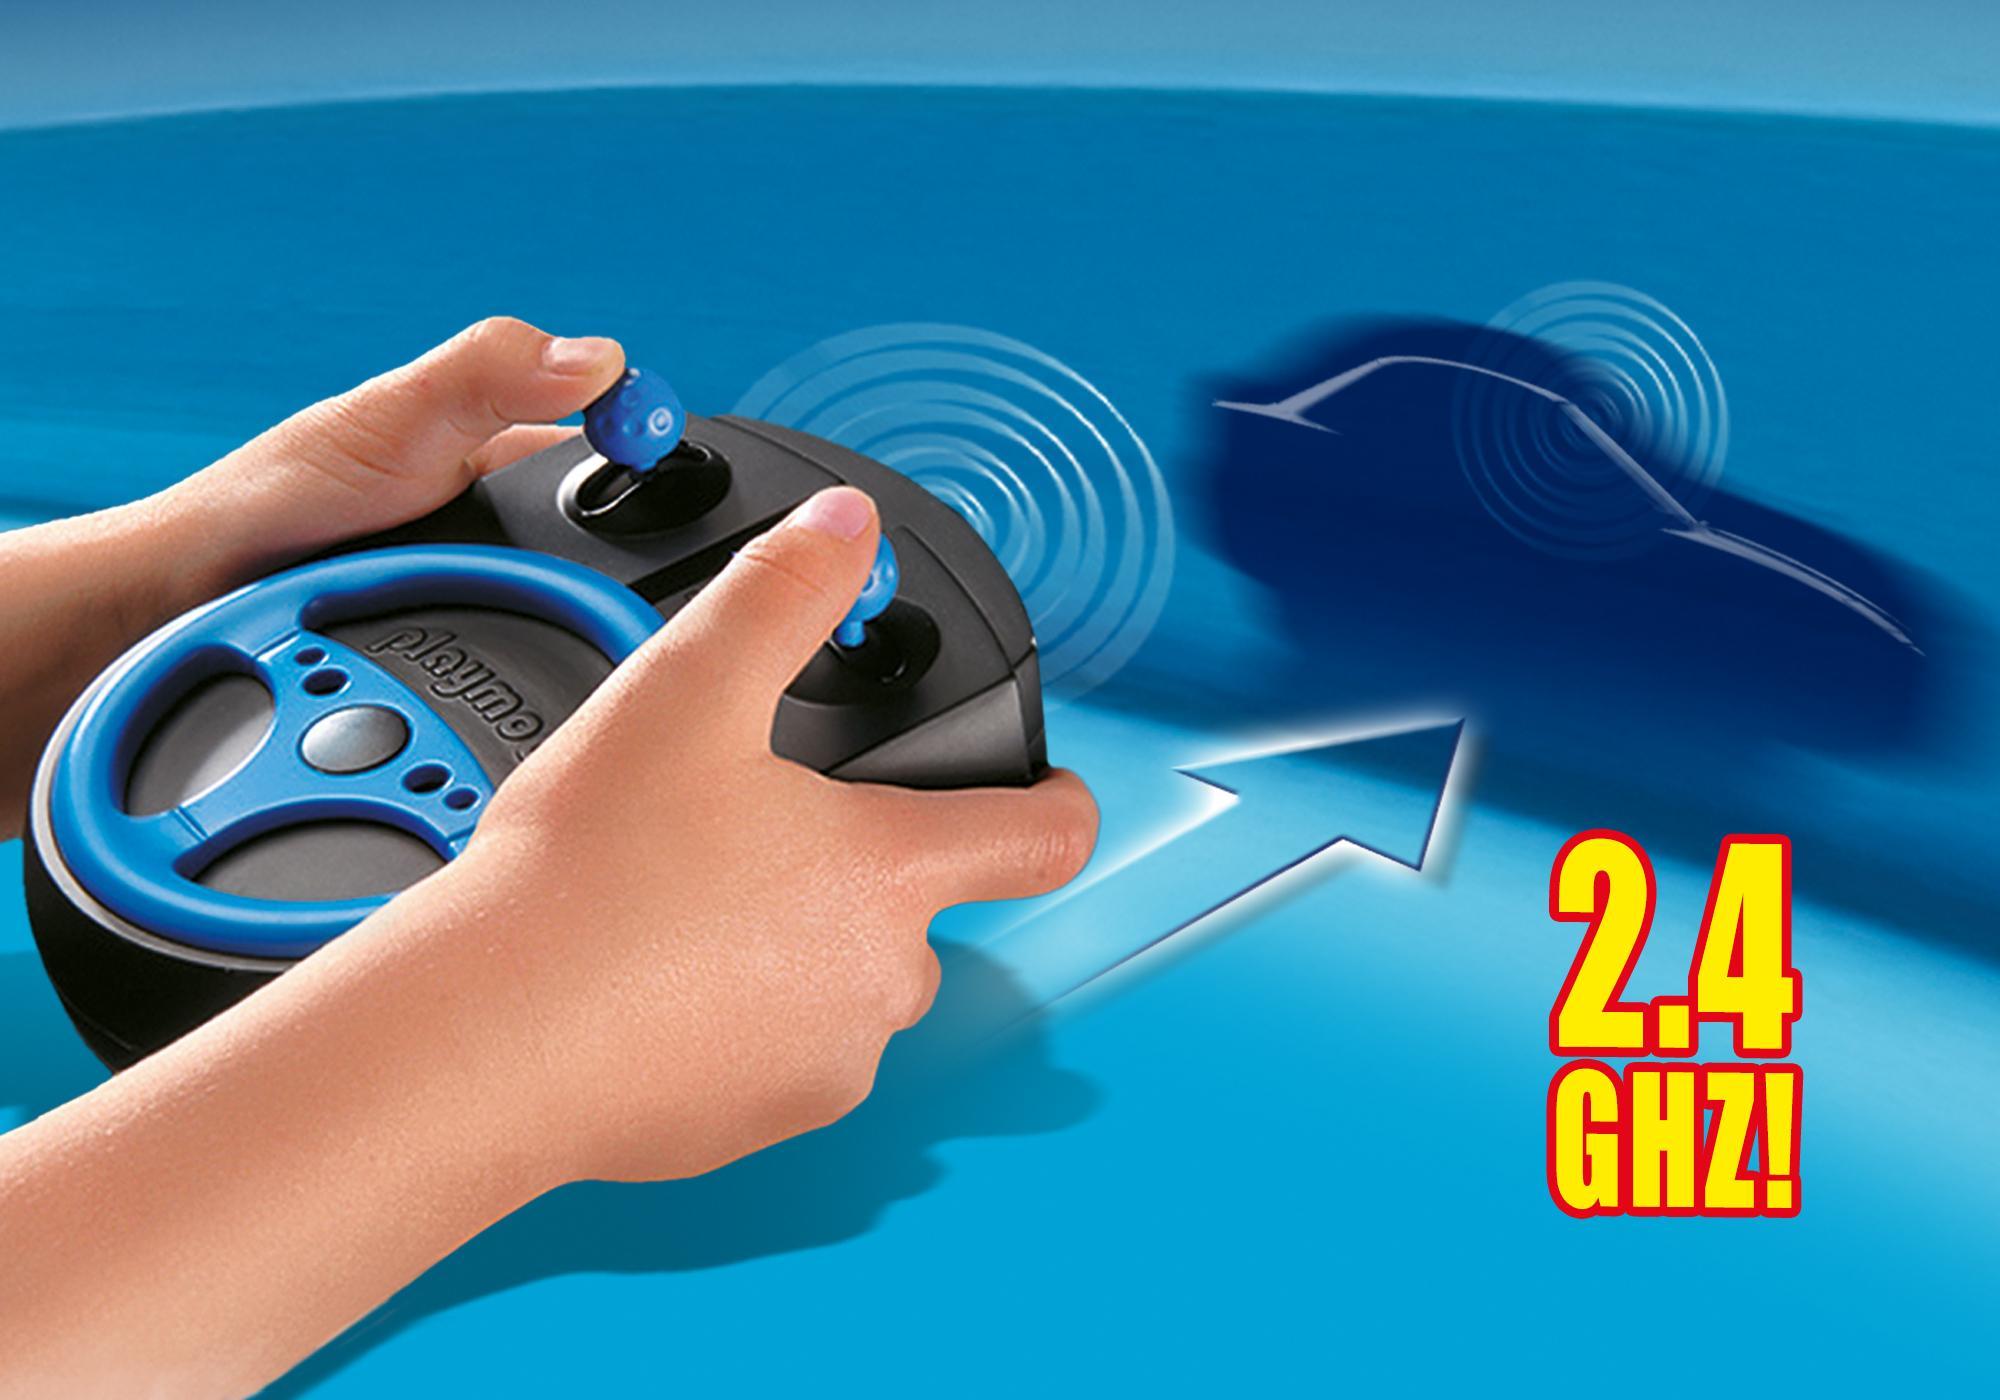 http://media.playmobil.com/i/playmobil/6914_product_extra2/Fjärrkontrollset 2,4 GHz